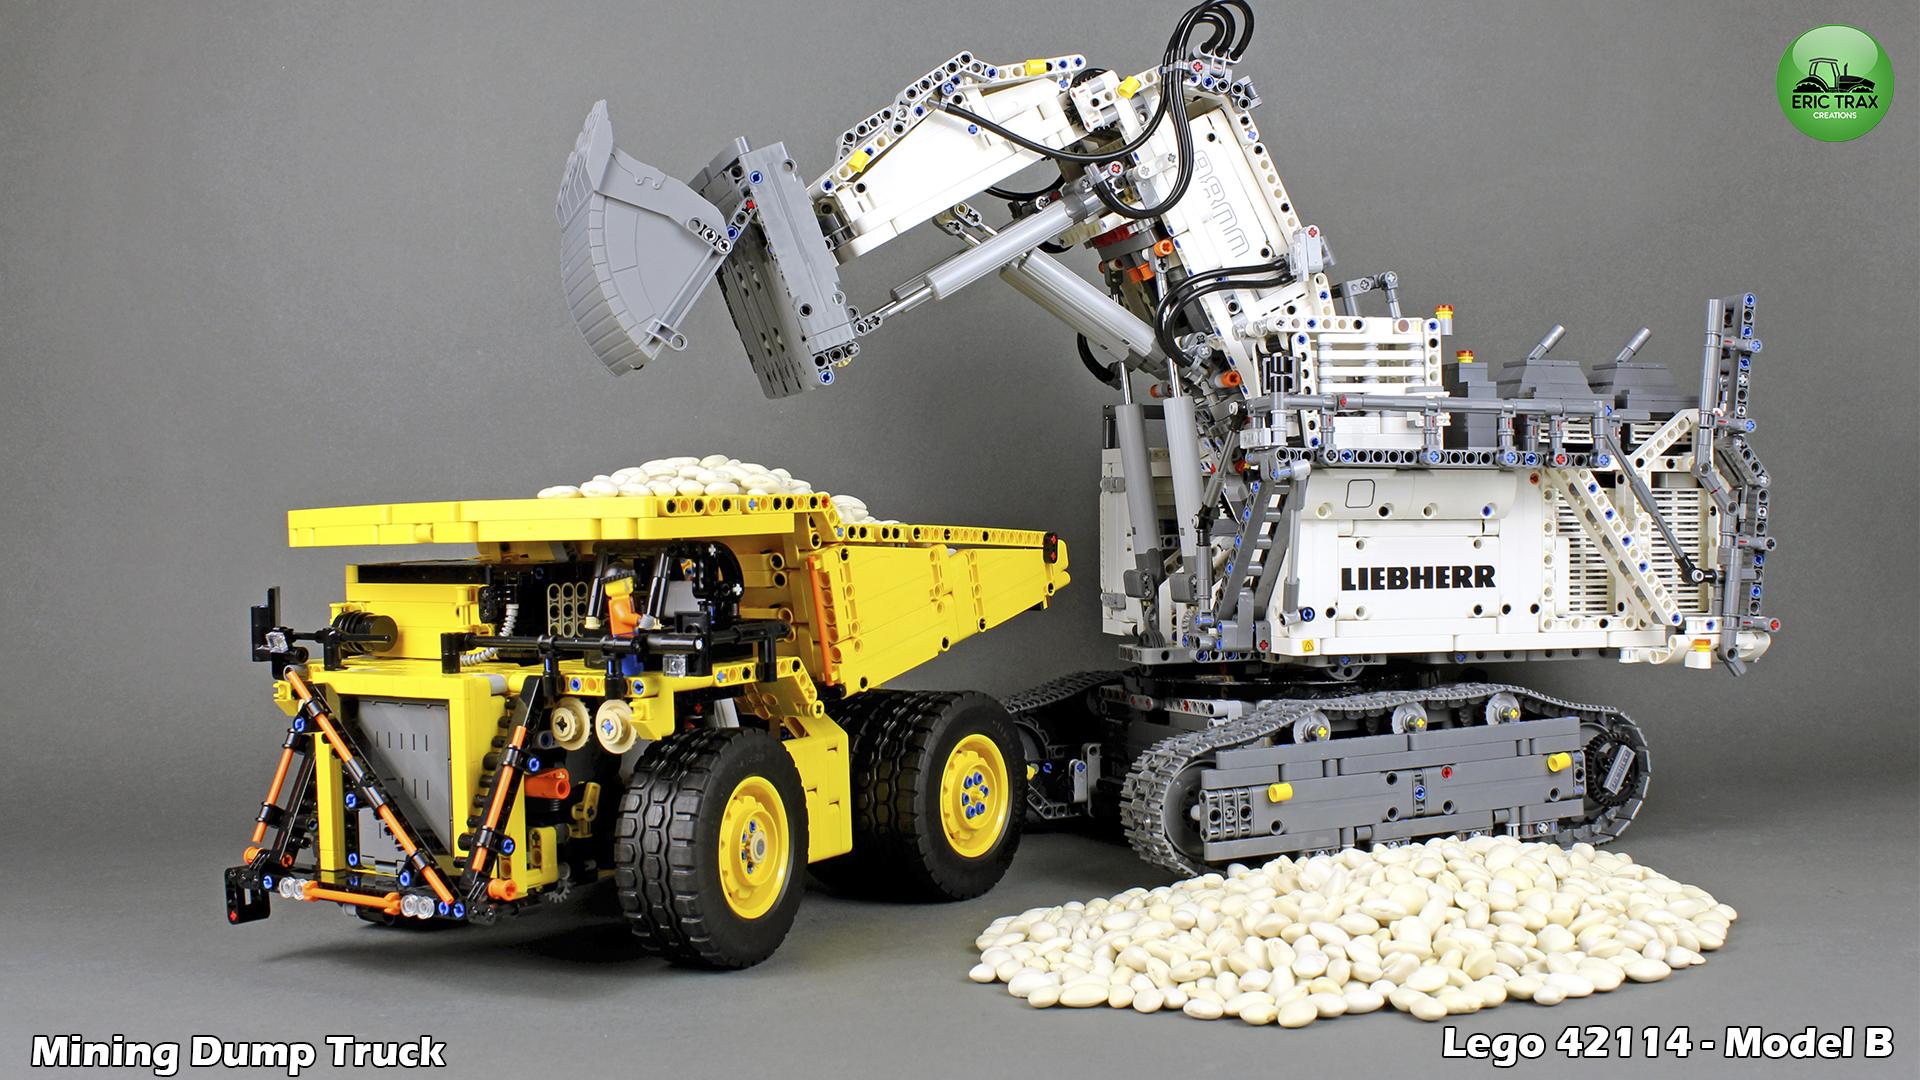 Quelle: Flickr - Michal Skorupka - Minning Dump Truck